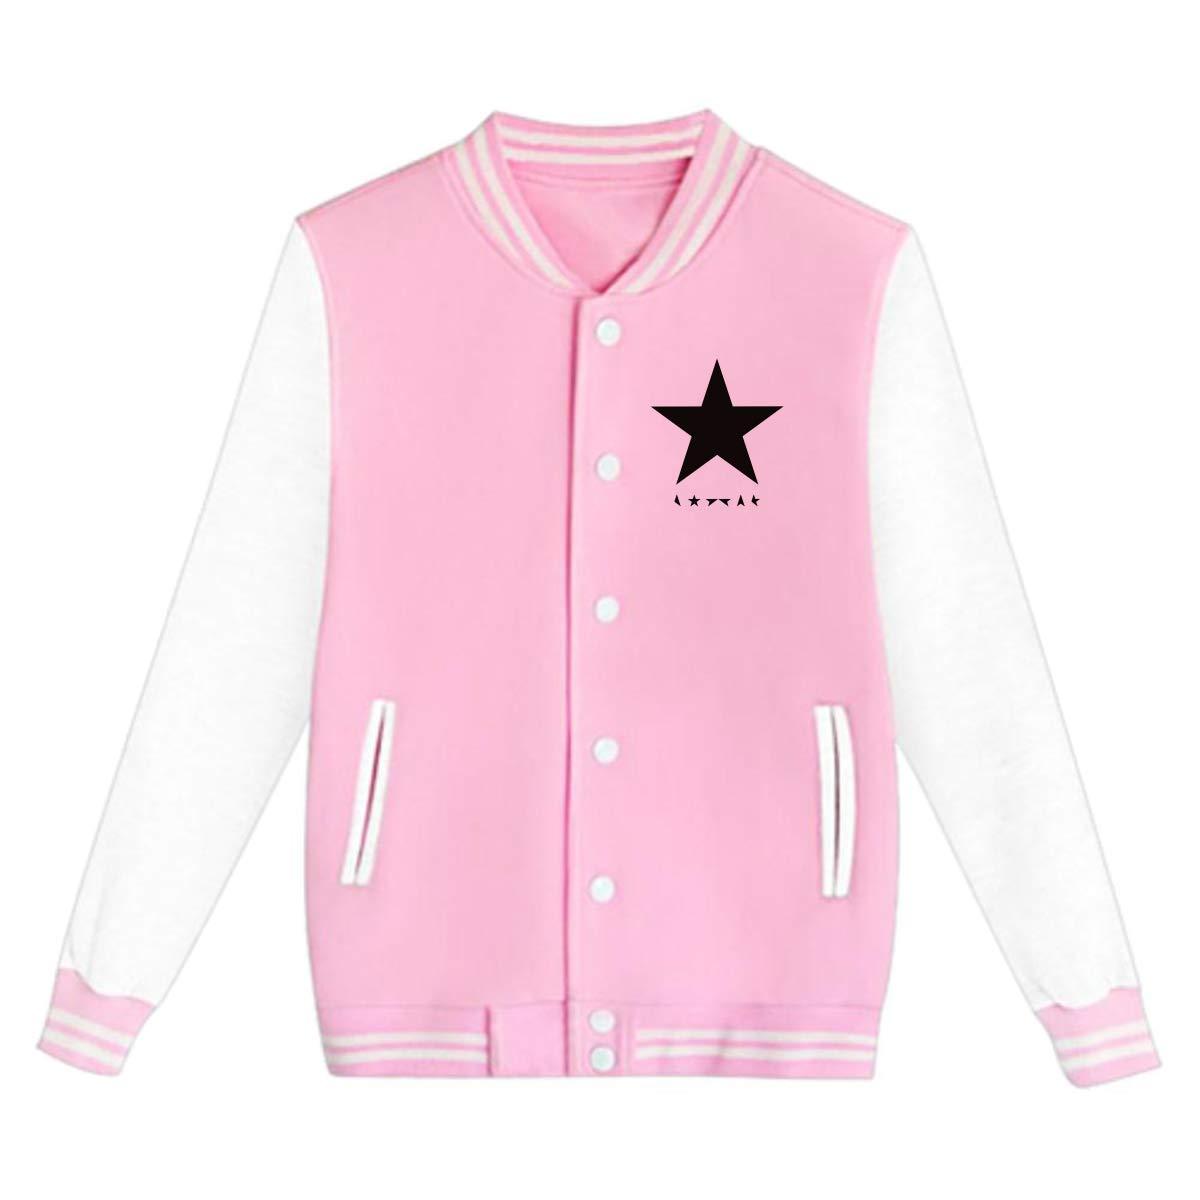 LIALUER David Bowie Blackstar Album Cover Boys Girls Baseball Jacket Uniform V Sweater Coat